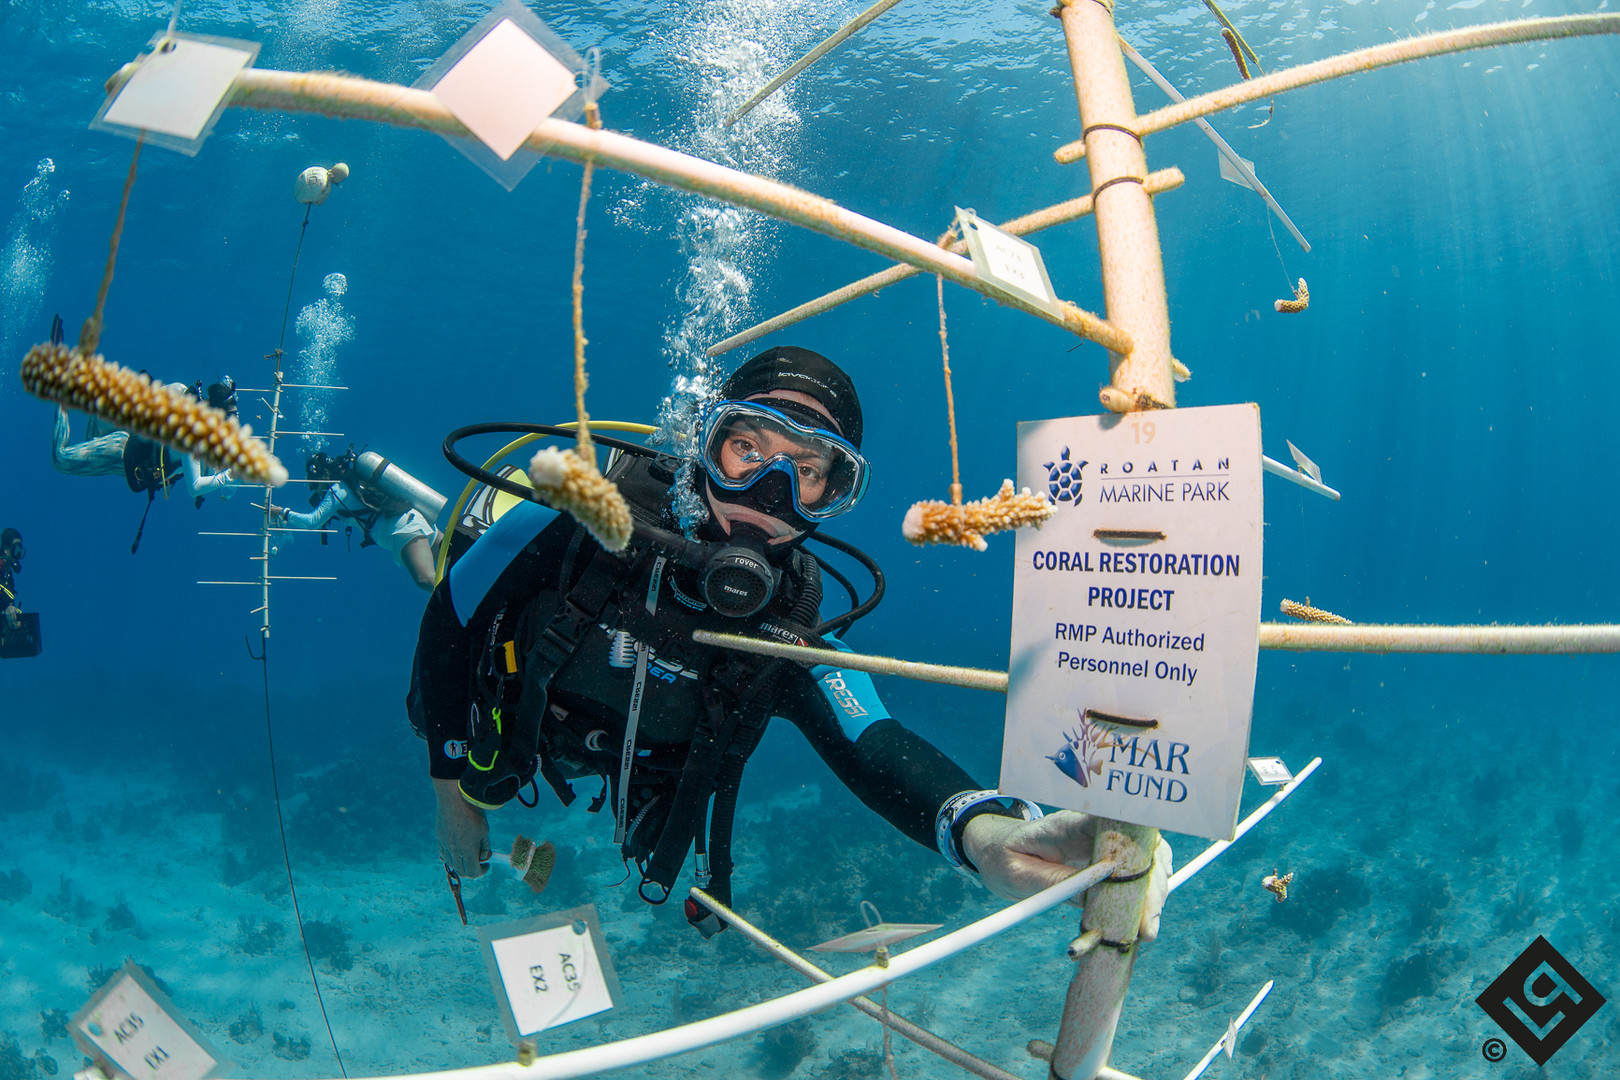 Coral Restoration RMP